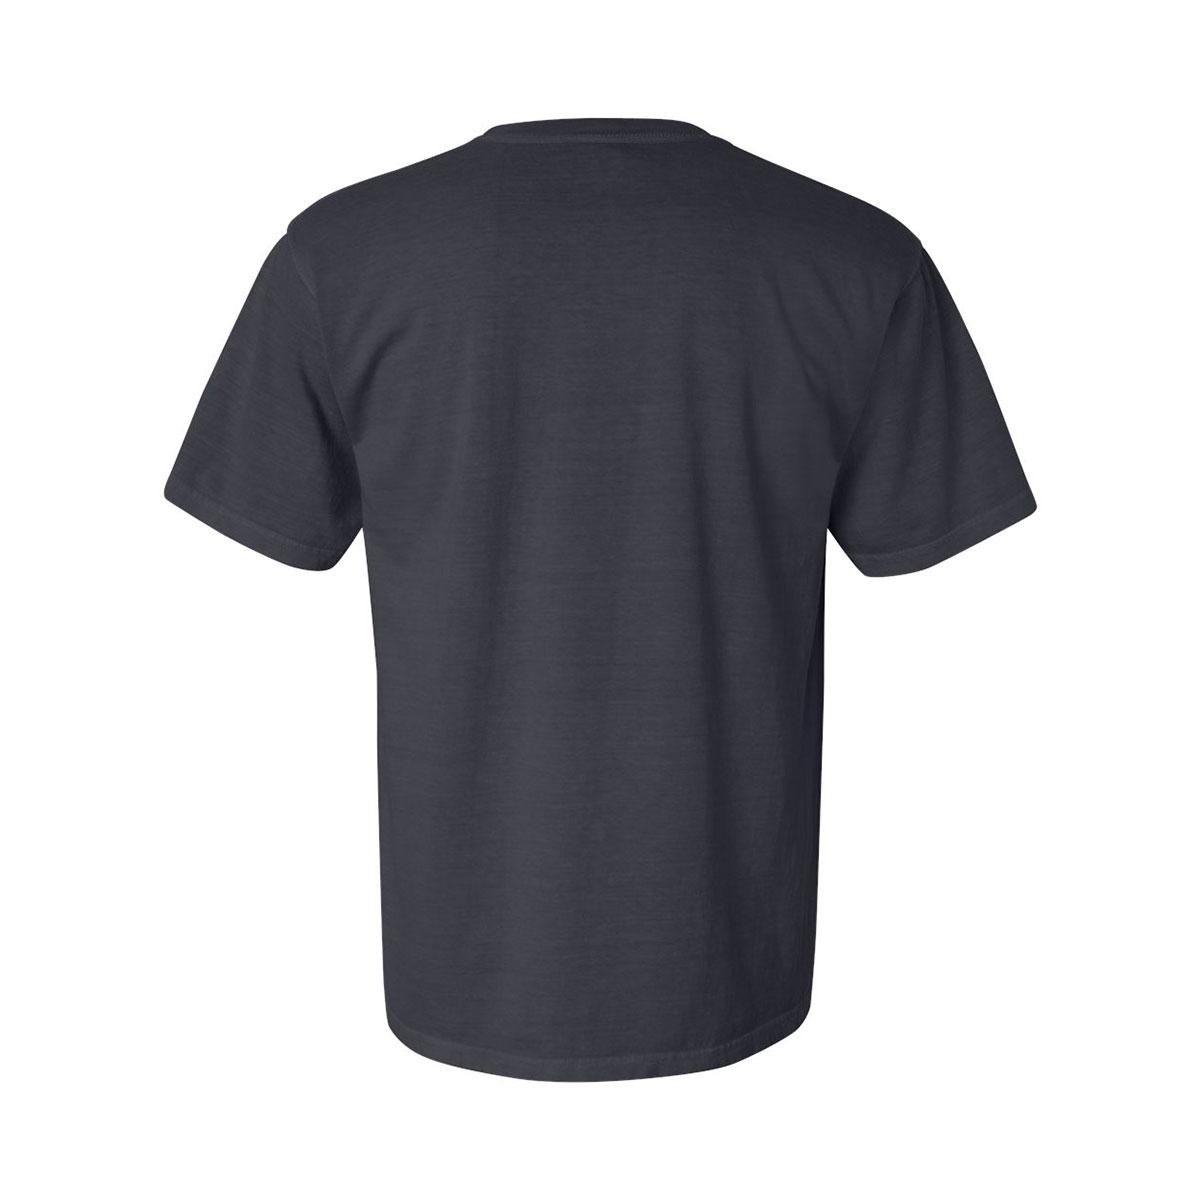 maj comfort comforter k color s hd pepper shirt shirts adult colors nd tee g t rekl